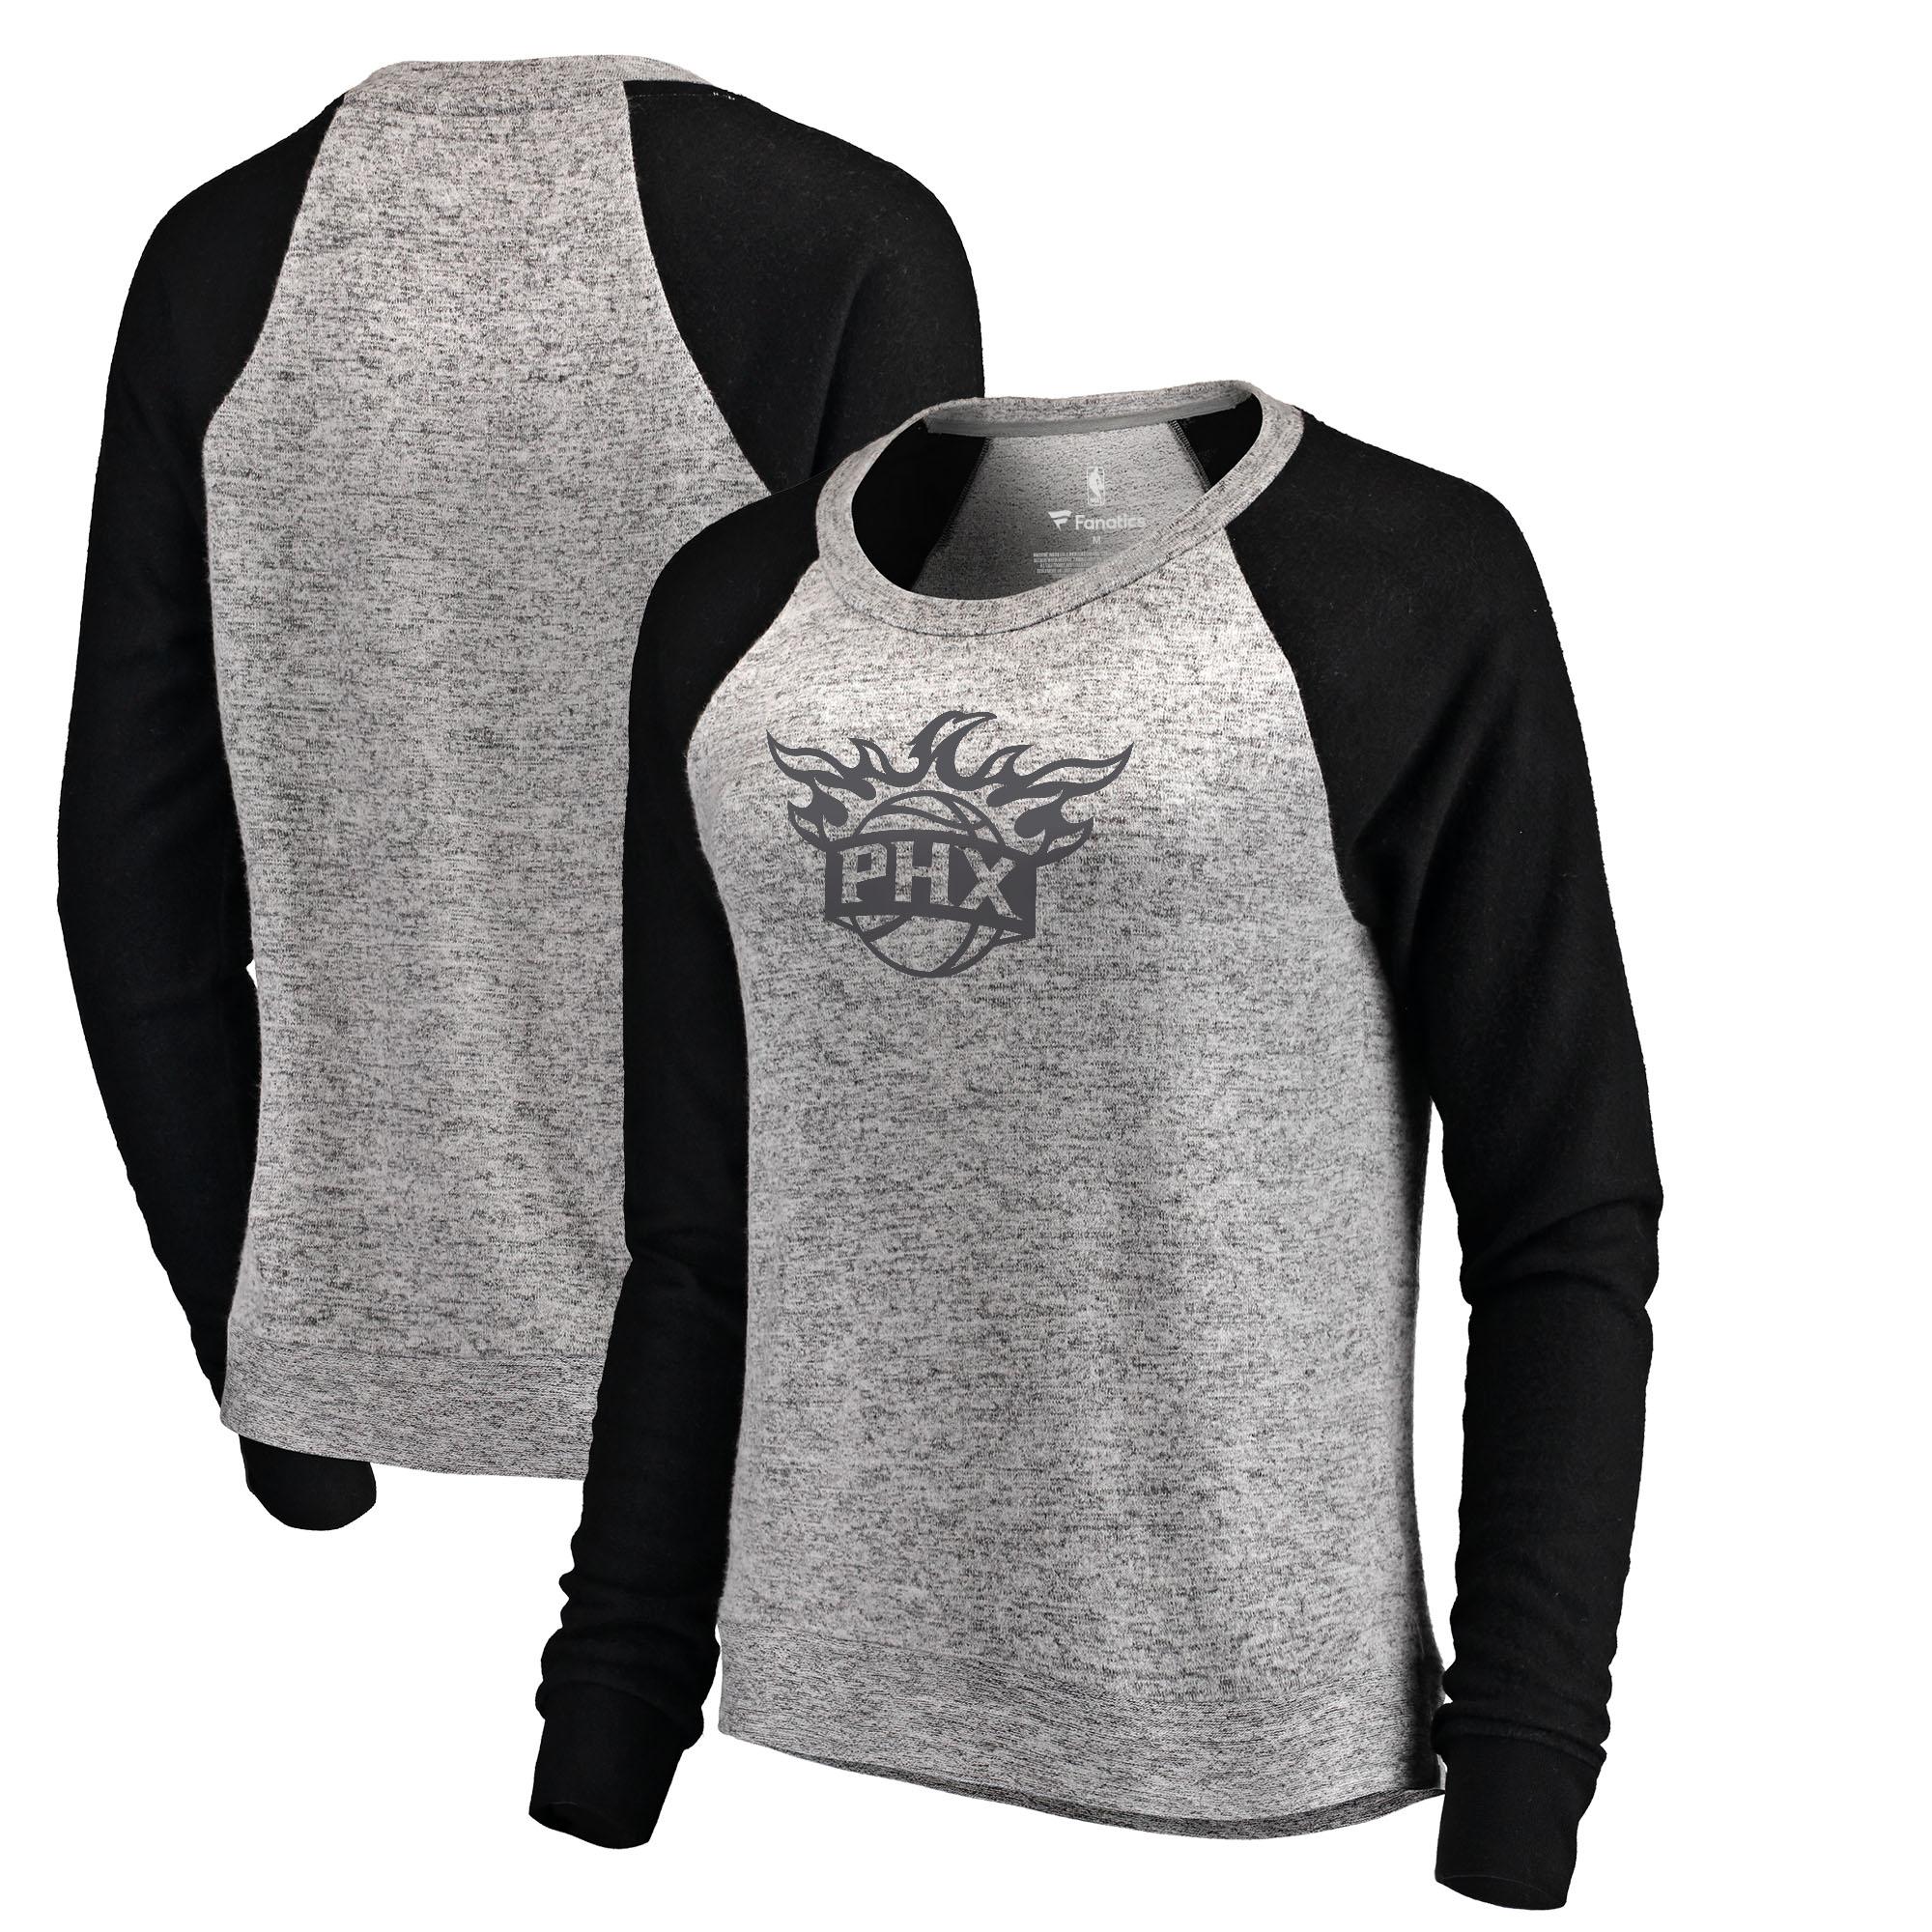 Phoenix Suns Let Loose by RNL Women's Cozy Collection Plush Raglan Crew Neck Sweatshirt - Ash/Black